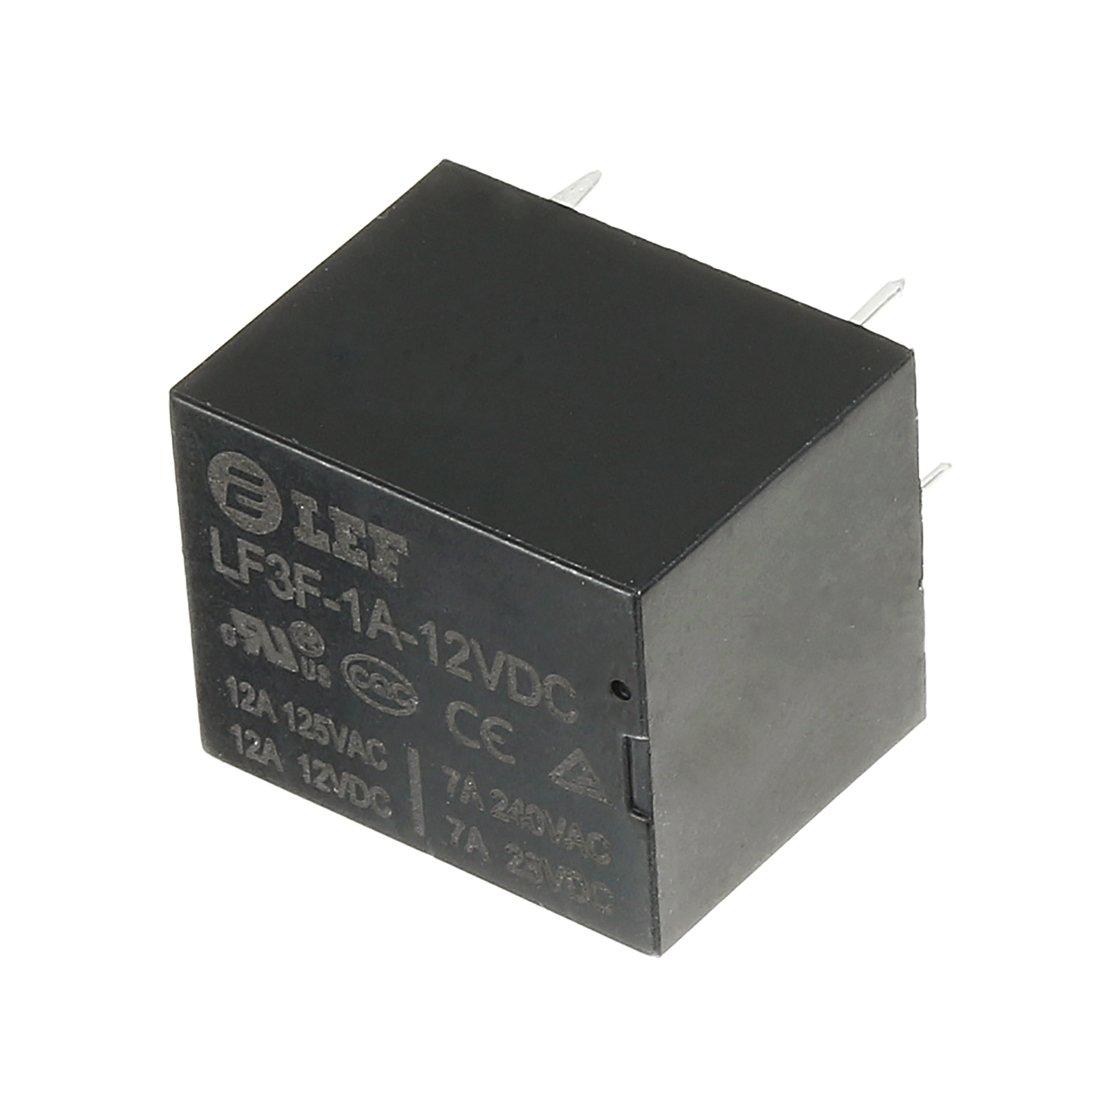 uxcell 10Pcs DC 12V Coil SPST NO 4P Power Electromagnetic Relay DIN Rail//PCB Mounted 125V//12V 12A 240V//28V 7A